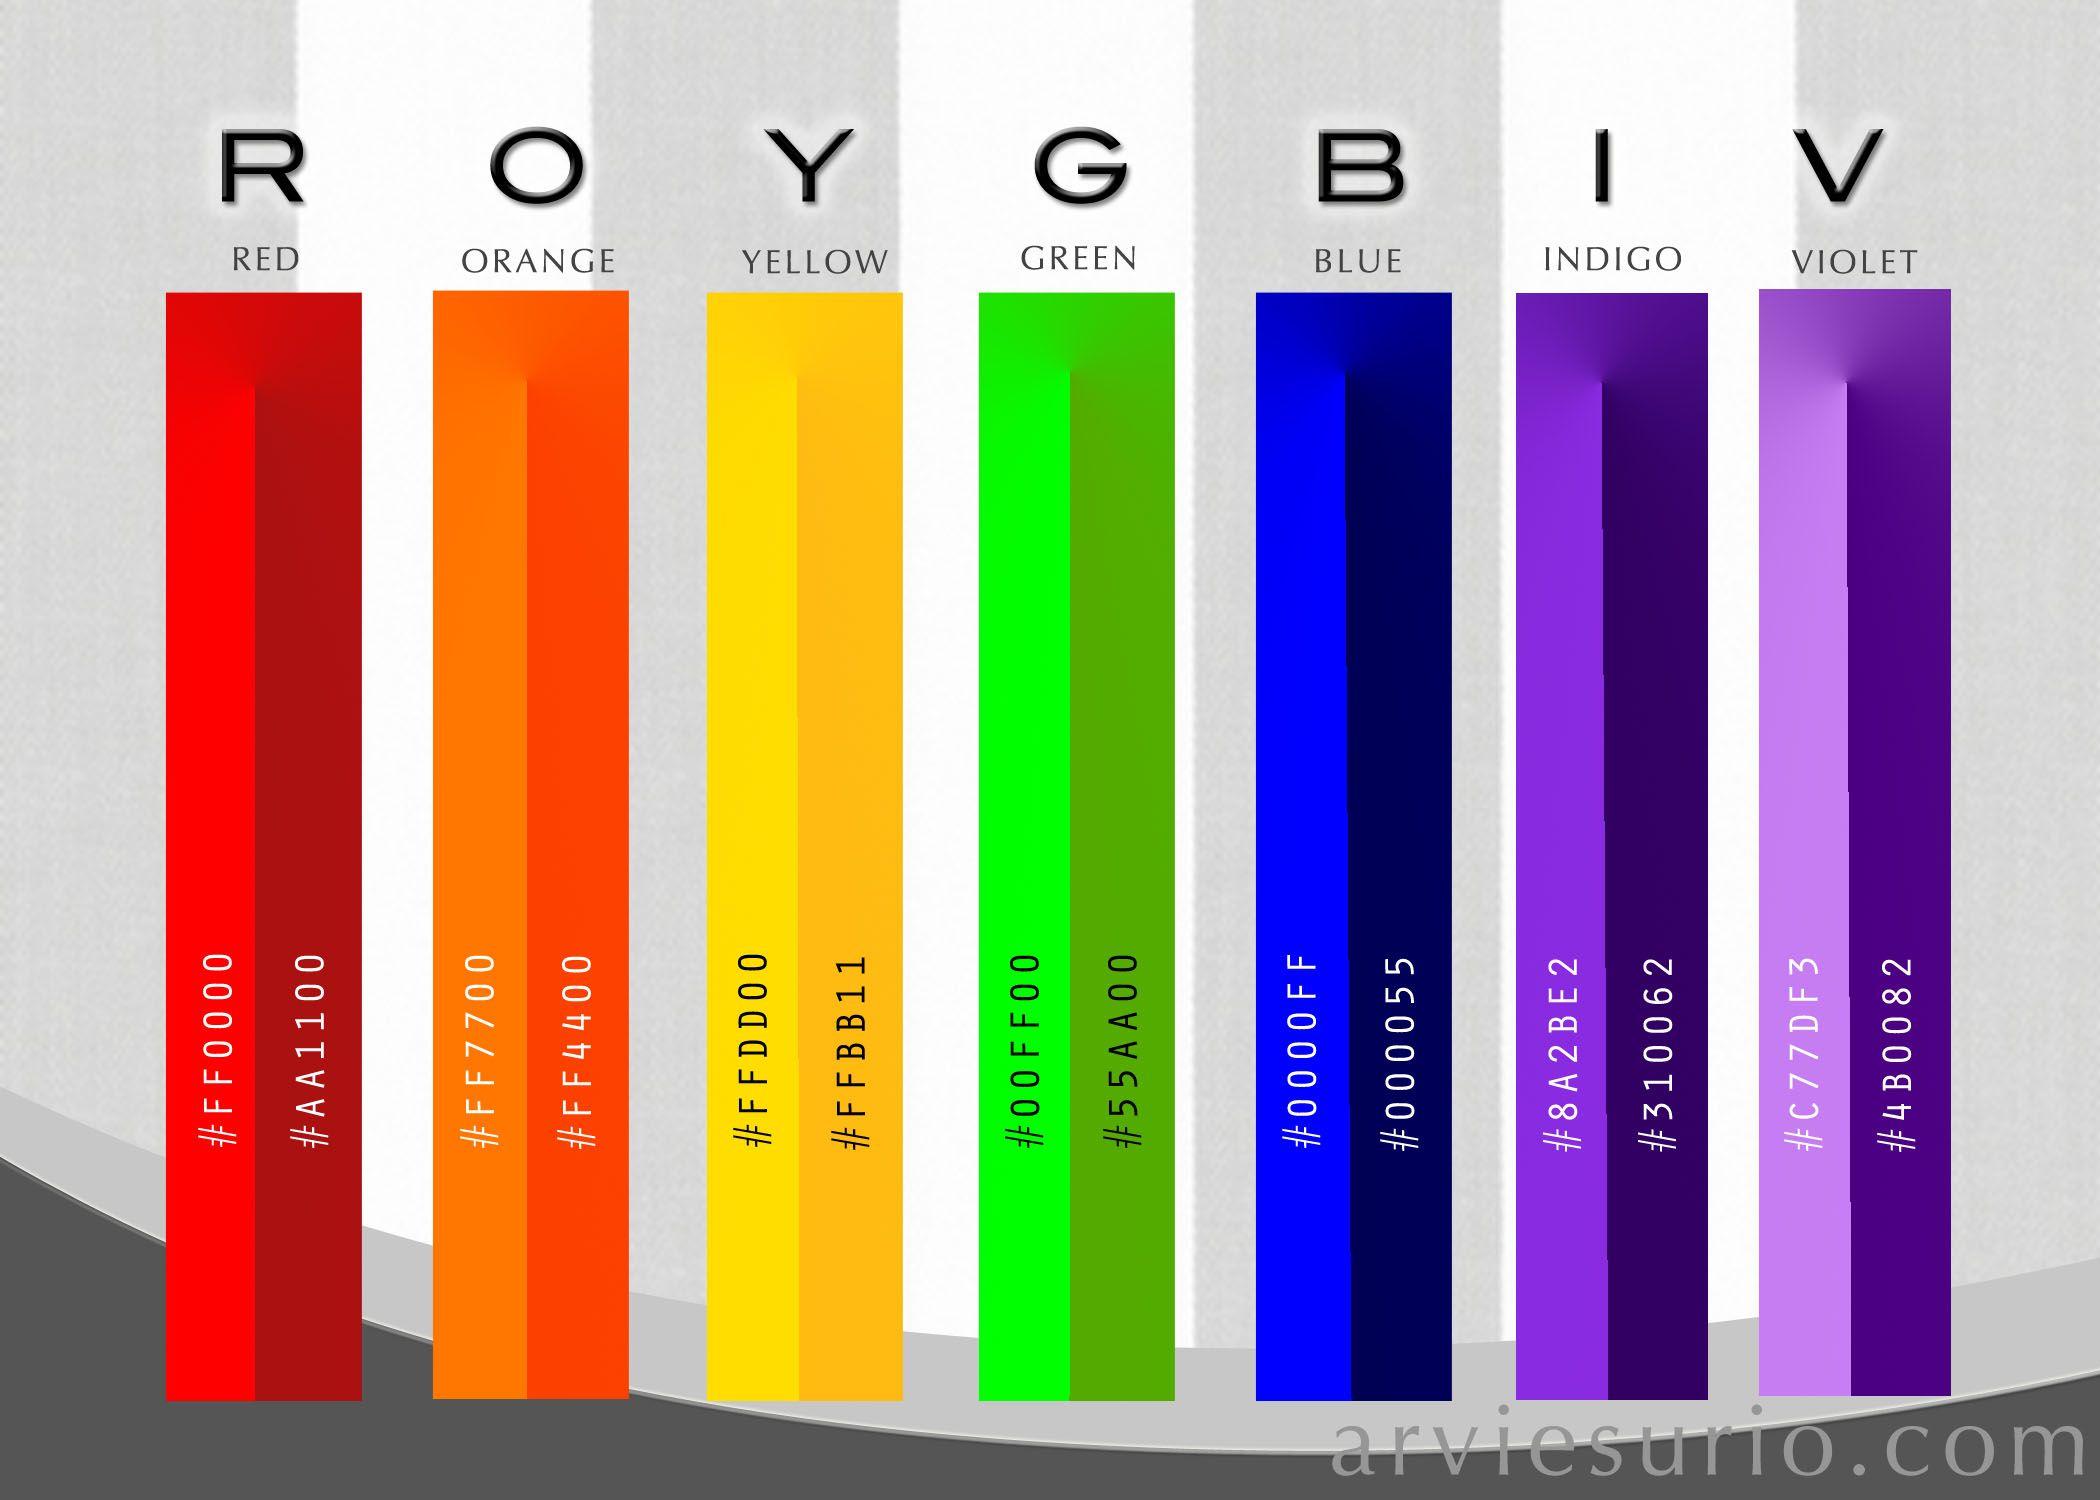 Rainbow Hexadecimal Code With Images